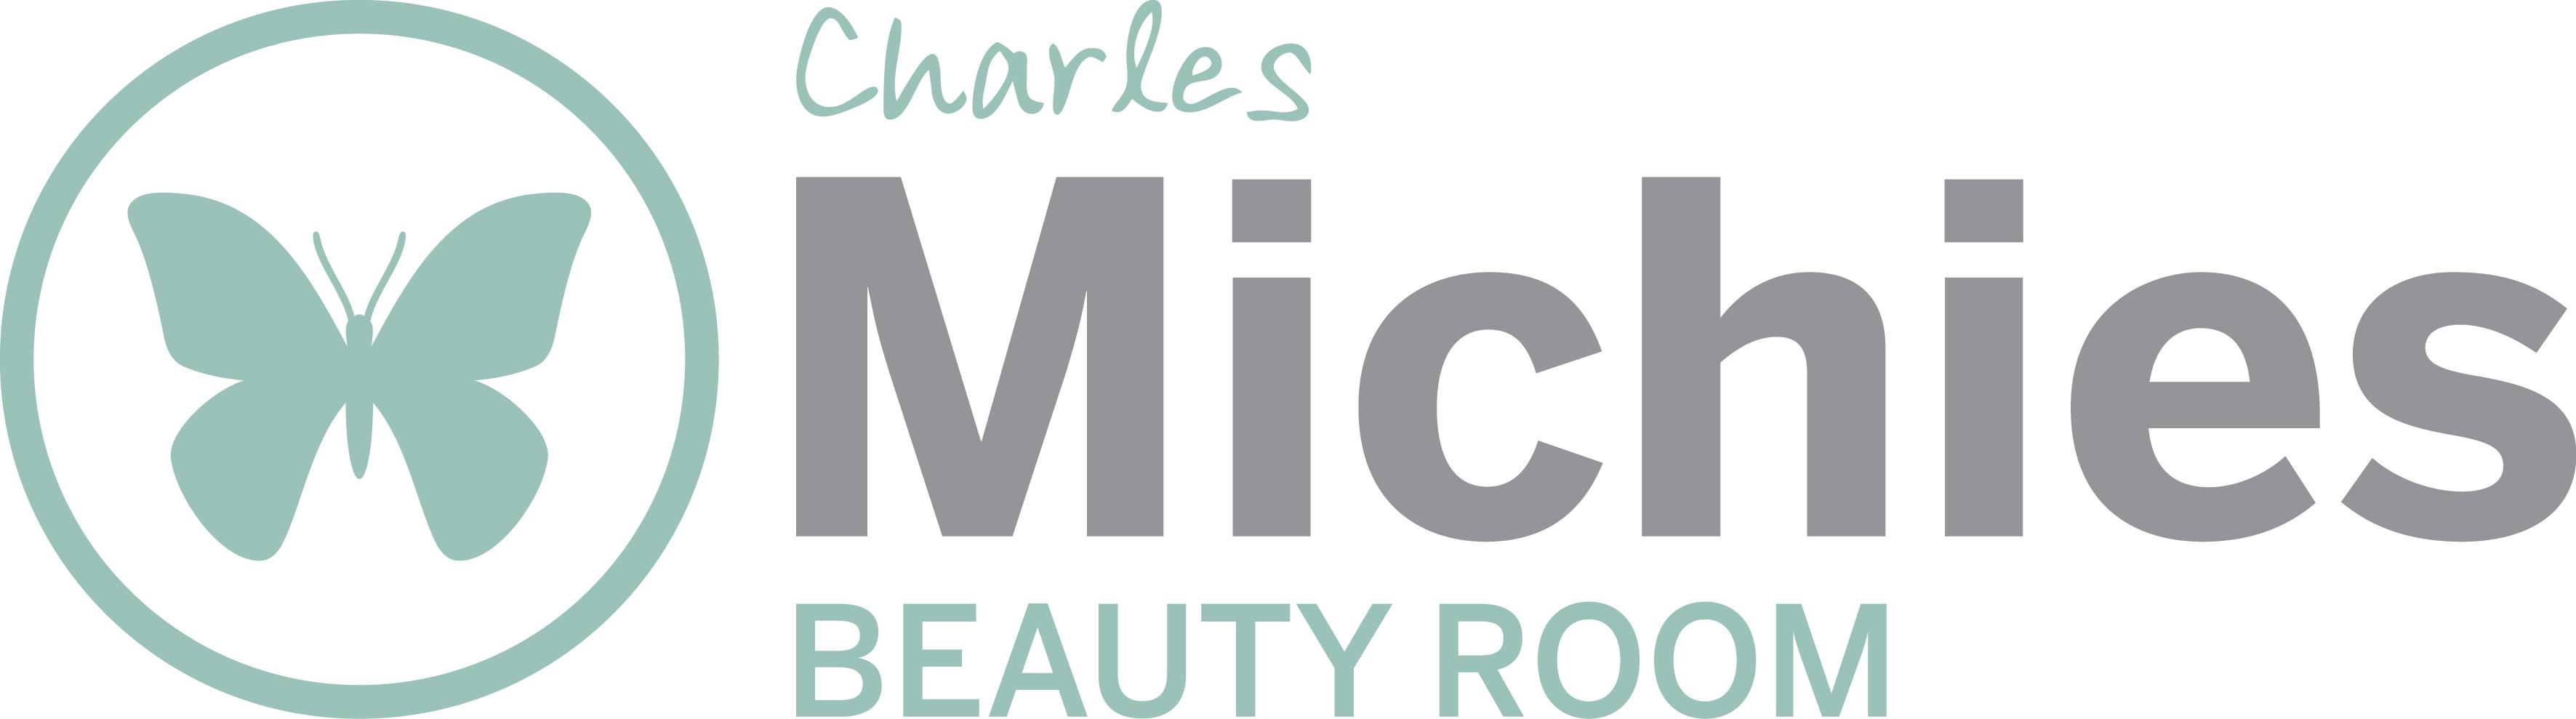 beautyrooms_logo